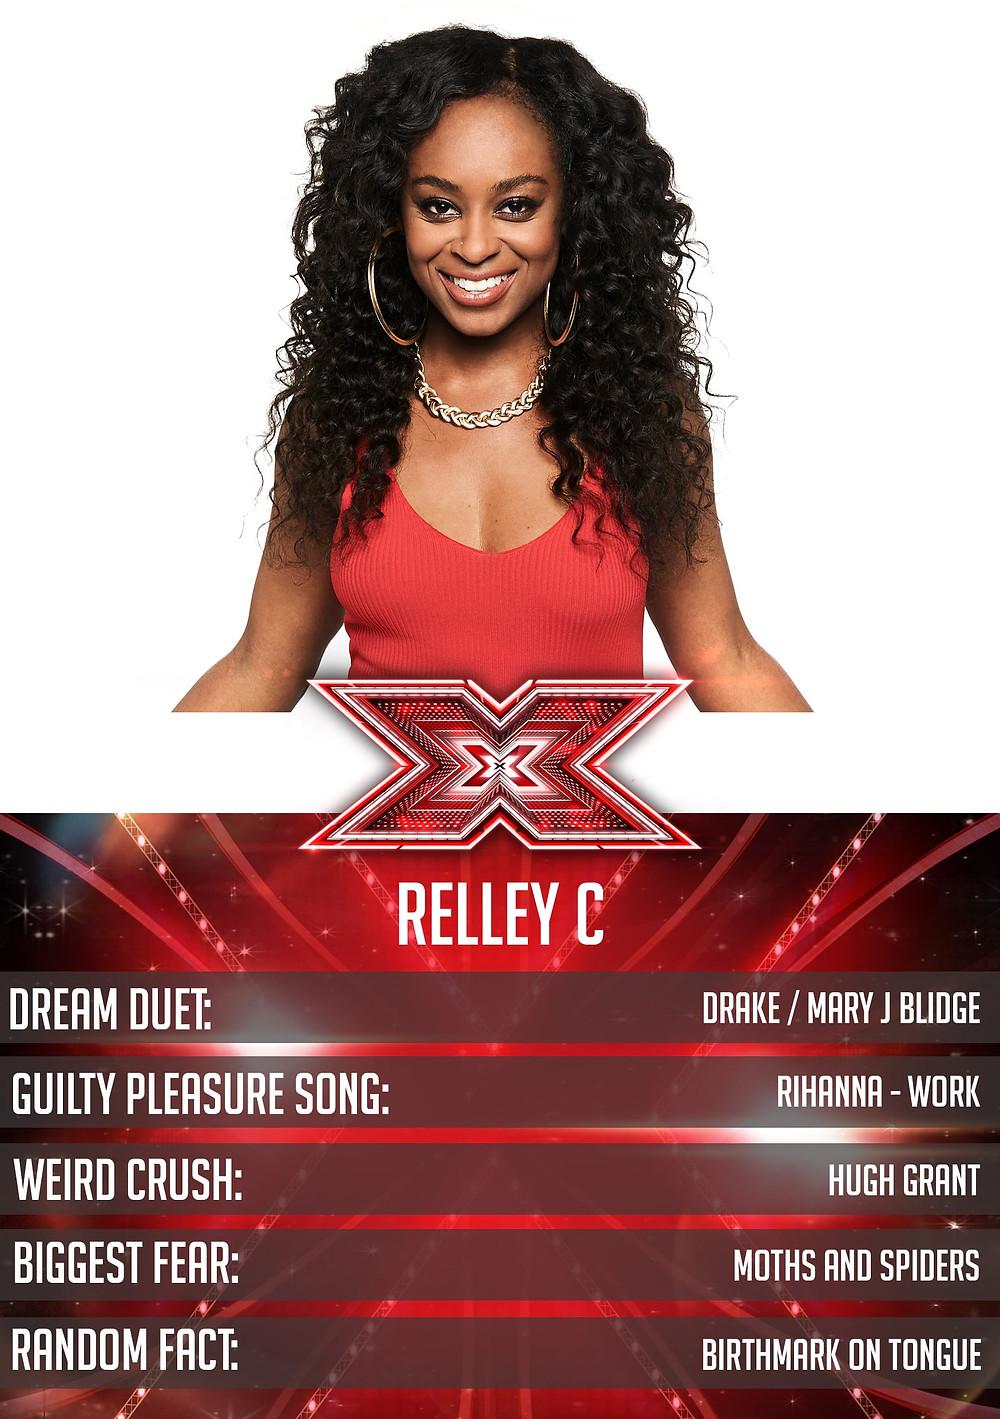 Relley C